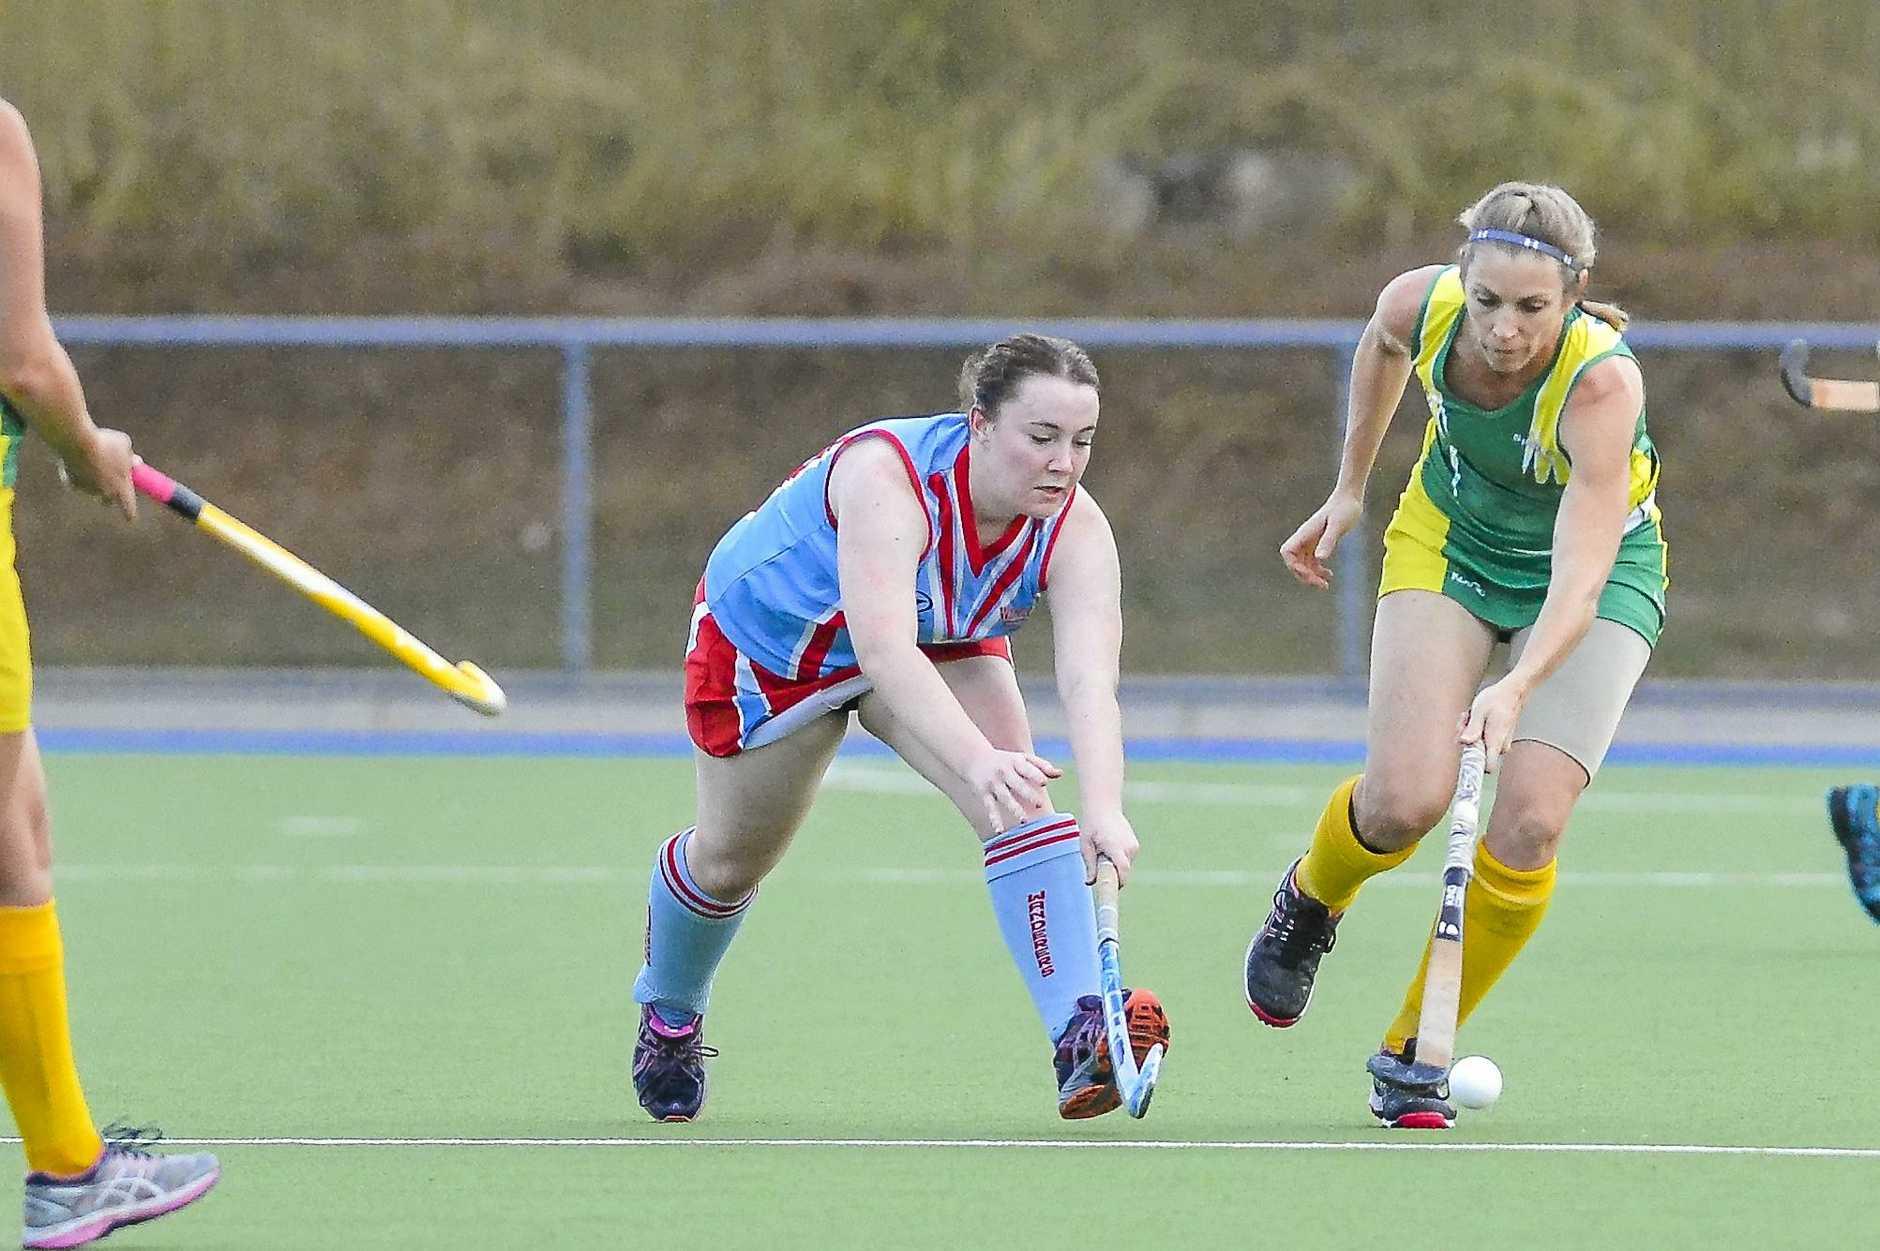 Wanderers' Gemma Koster and Sparks' Tarryn Job